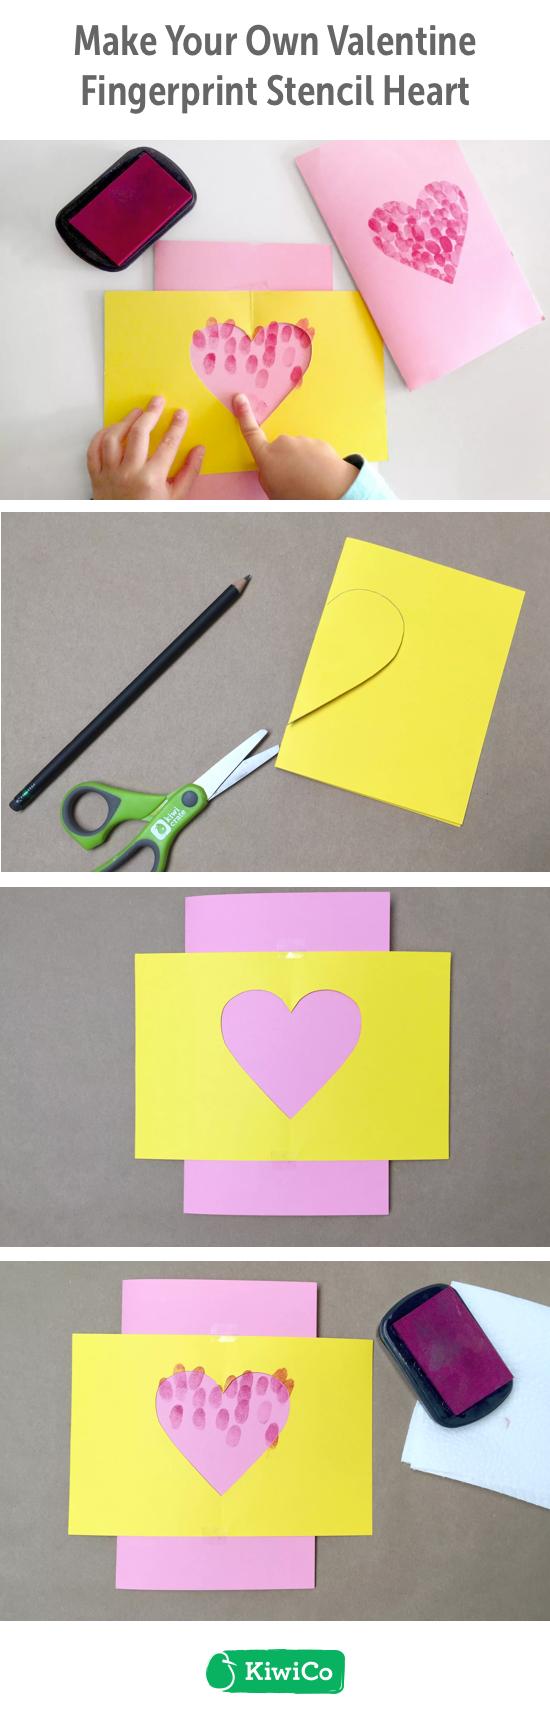 Valentine fingerprint stencil heart diy this do it yourself paper valentine fingerprint stencil heart diy this do it yourself paper craft is great solutioingenieria Gallery